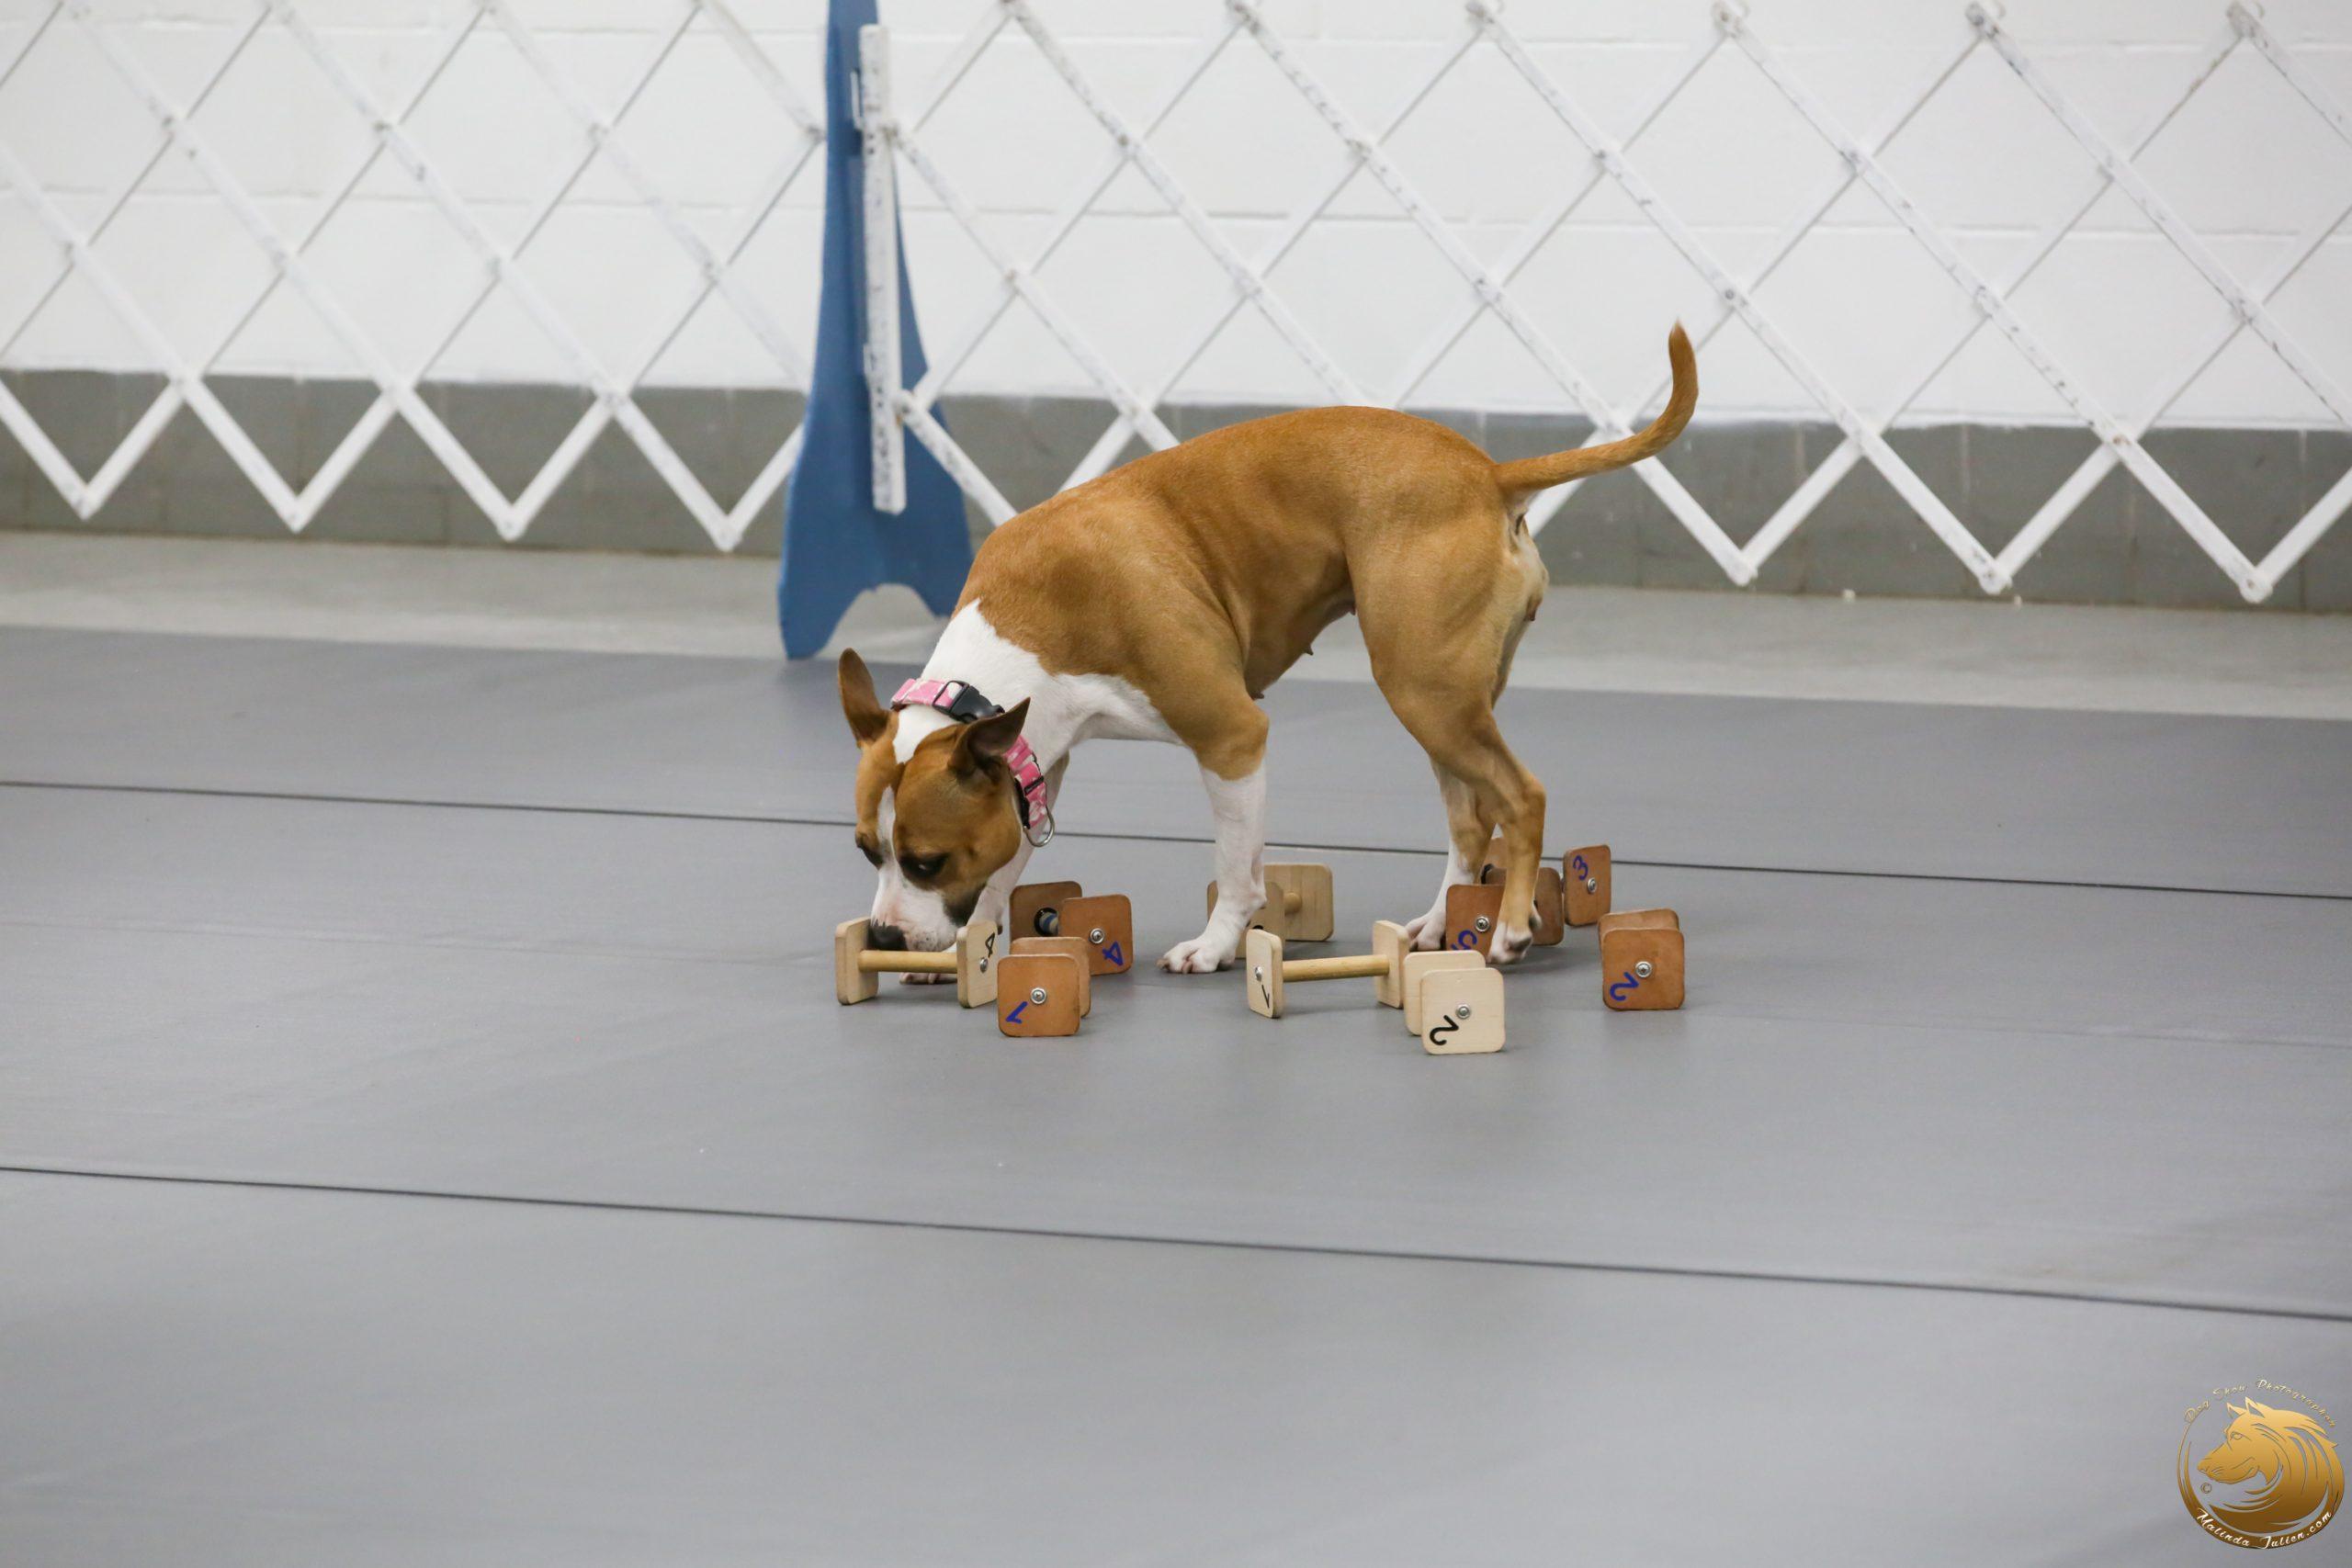 American Staffordshire Terrier 94 FRI Sylvie Nuzzolilo_JJJ_1878_GLNRSE19-HR3